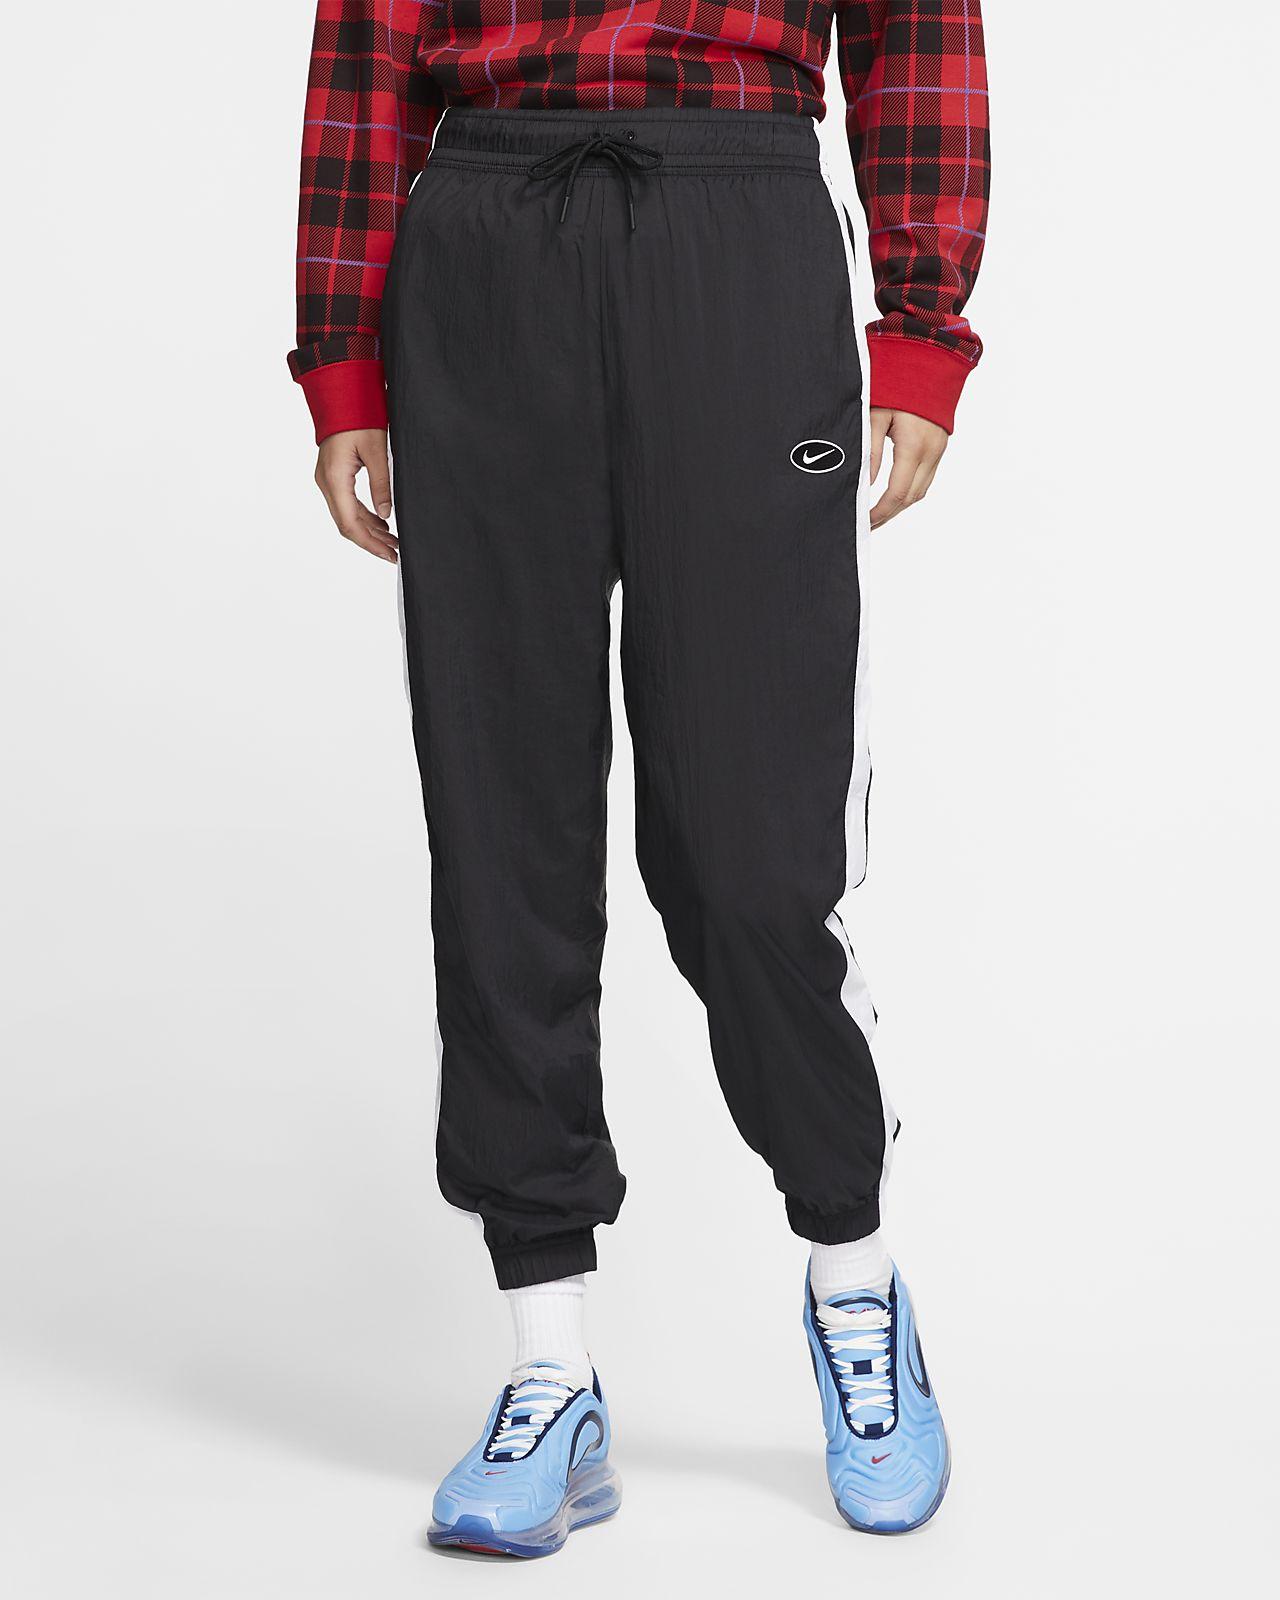 Pantalon tissé avec Swoosh Nike Sportswear